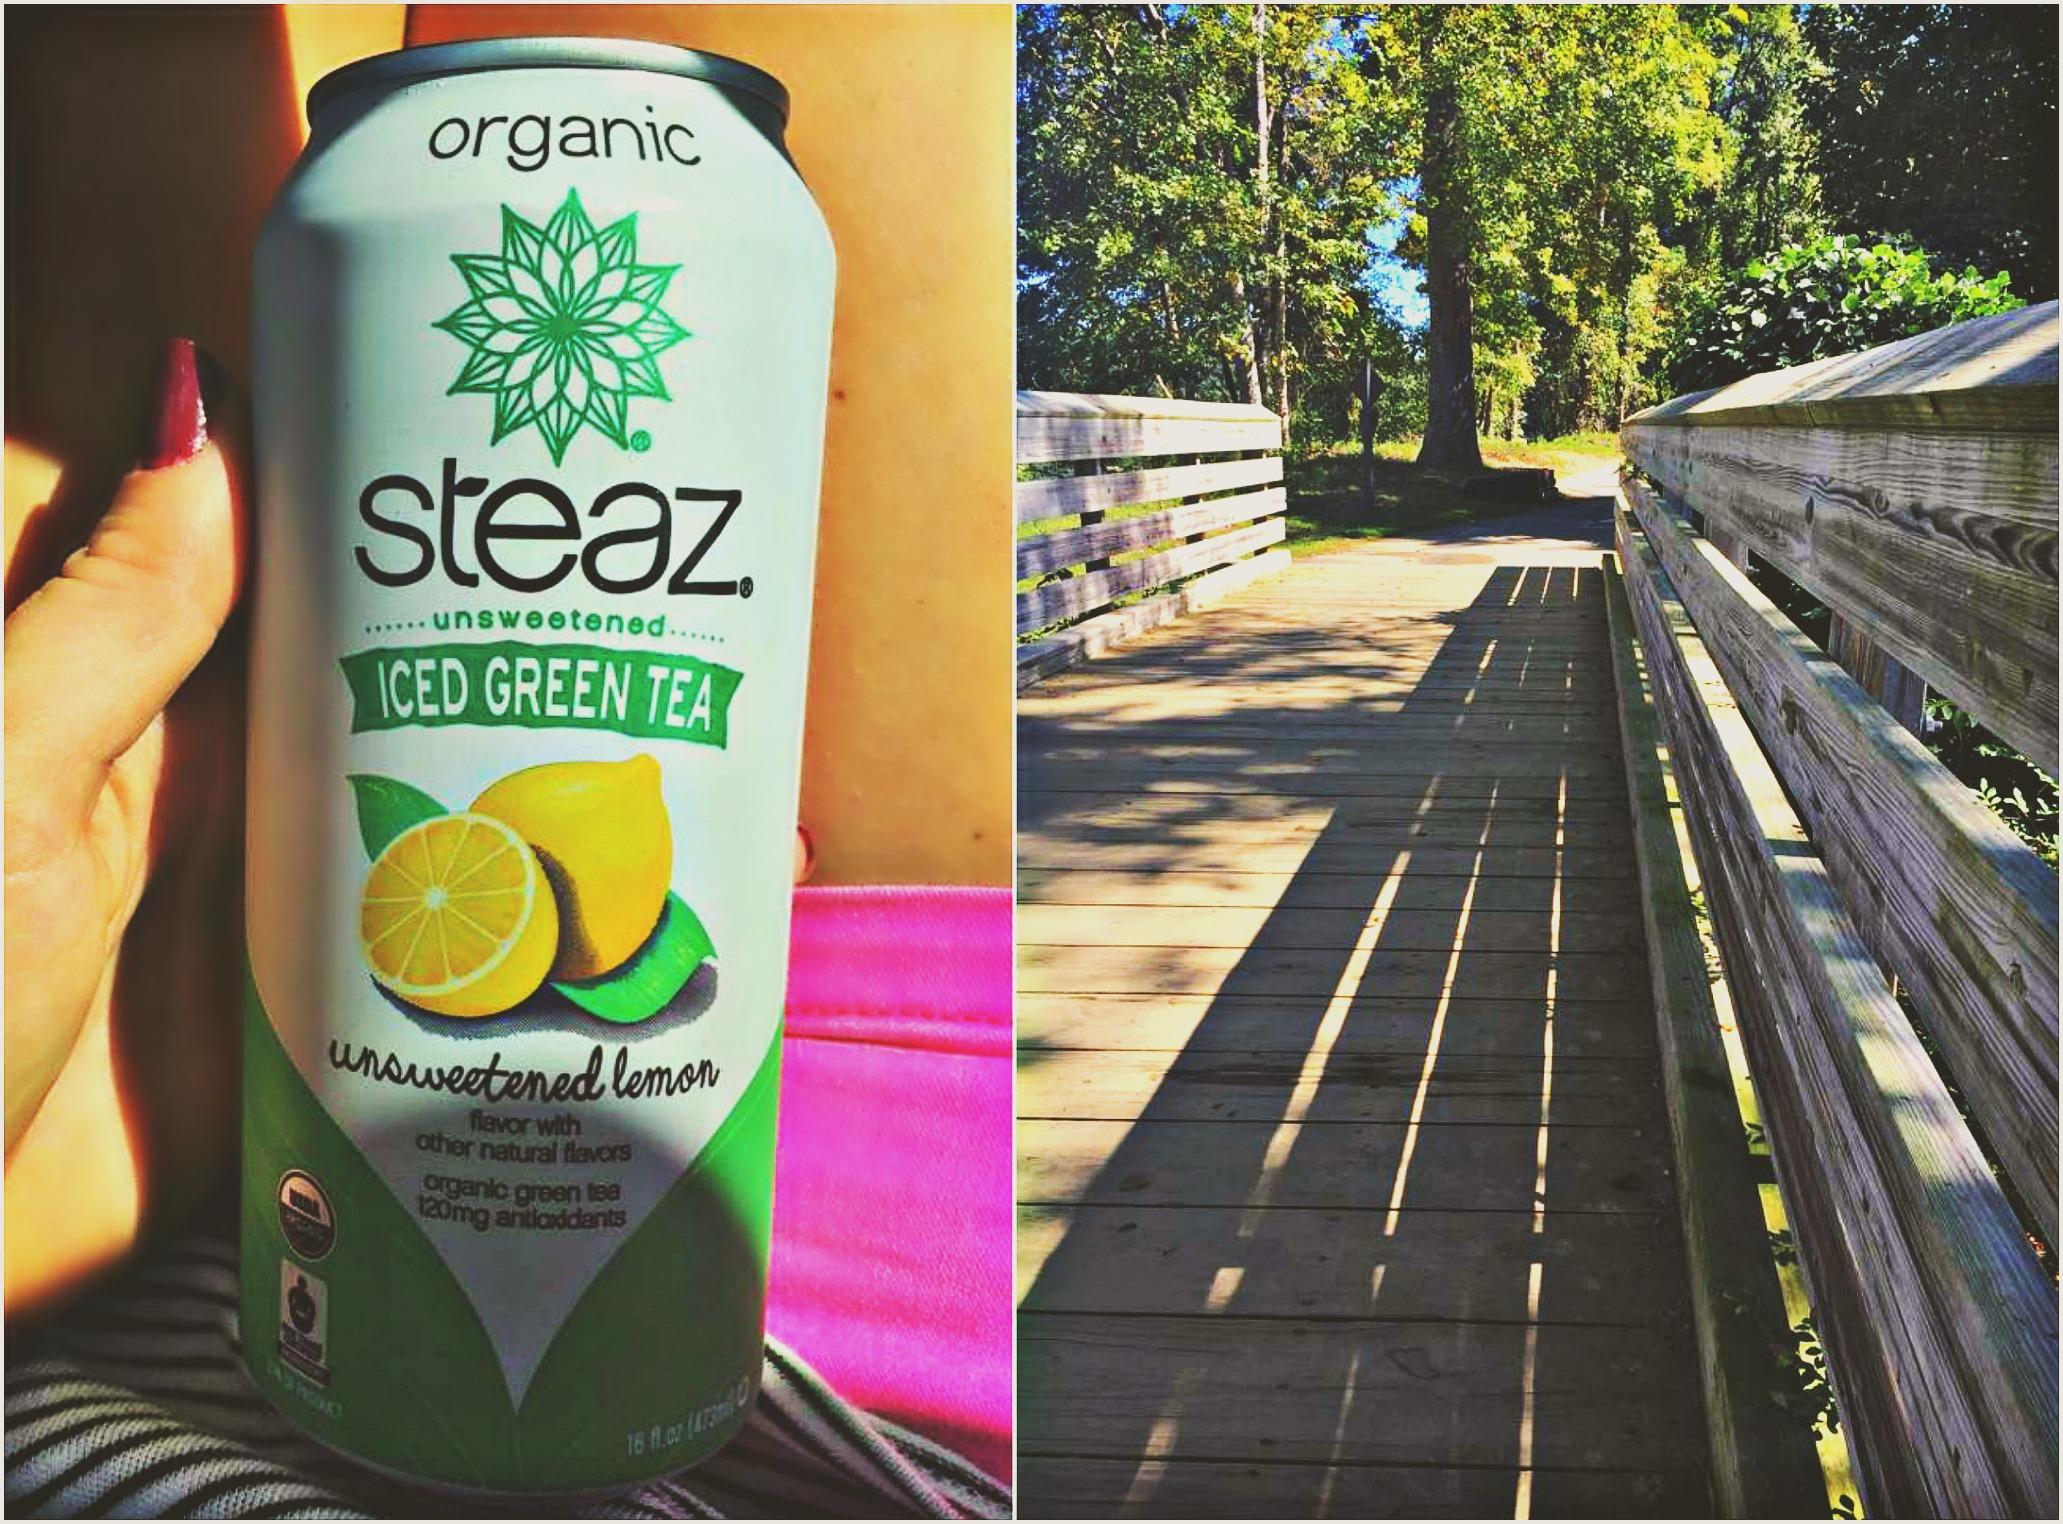 organic steaz iced green tea